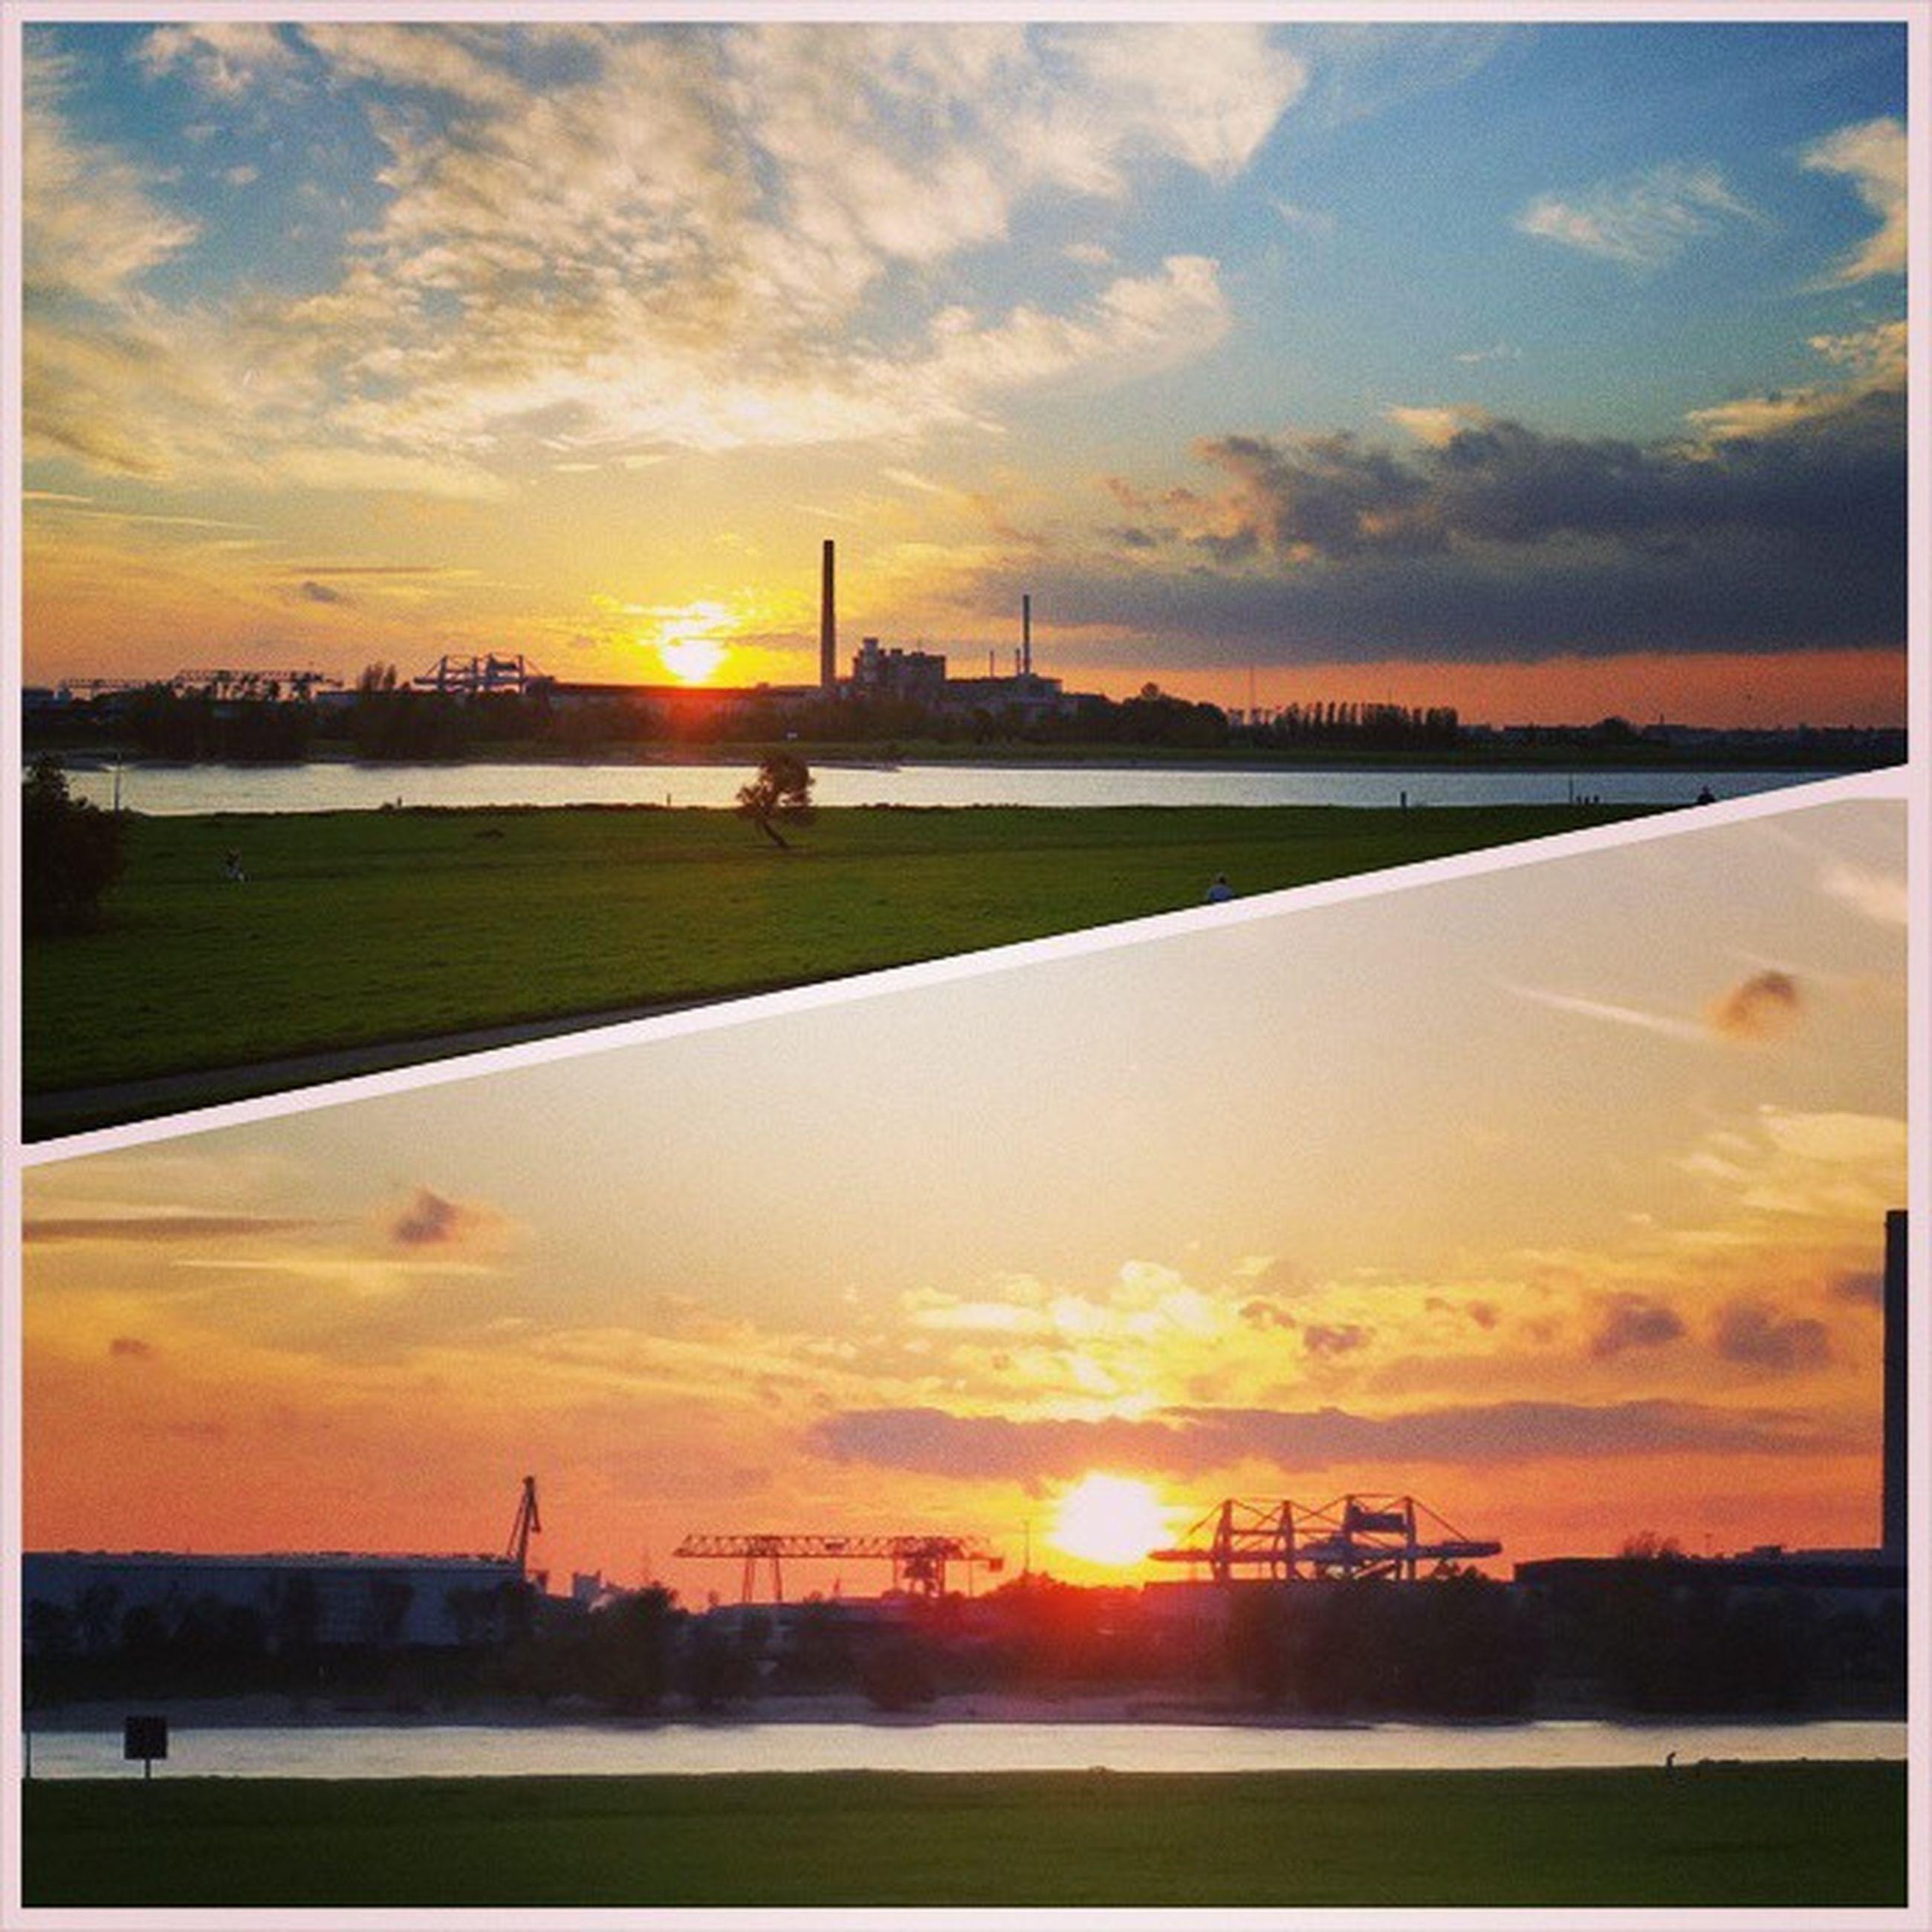 sunset, sun, orange color, sky, scenics, water, silhouette, beauty in nature, tranquil scene, cloud - sky, tranquility, sunlight, idyllic, nature, landscape, cloud, field, architecture, built structure, reflection